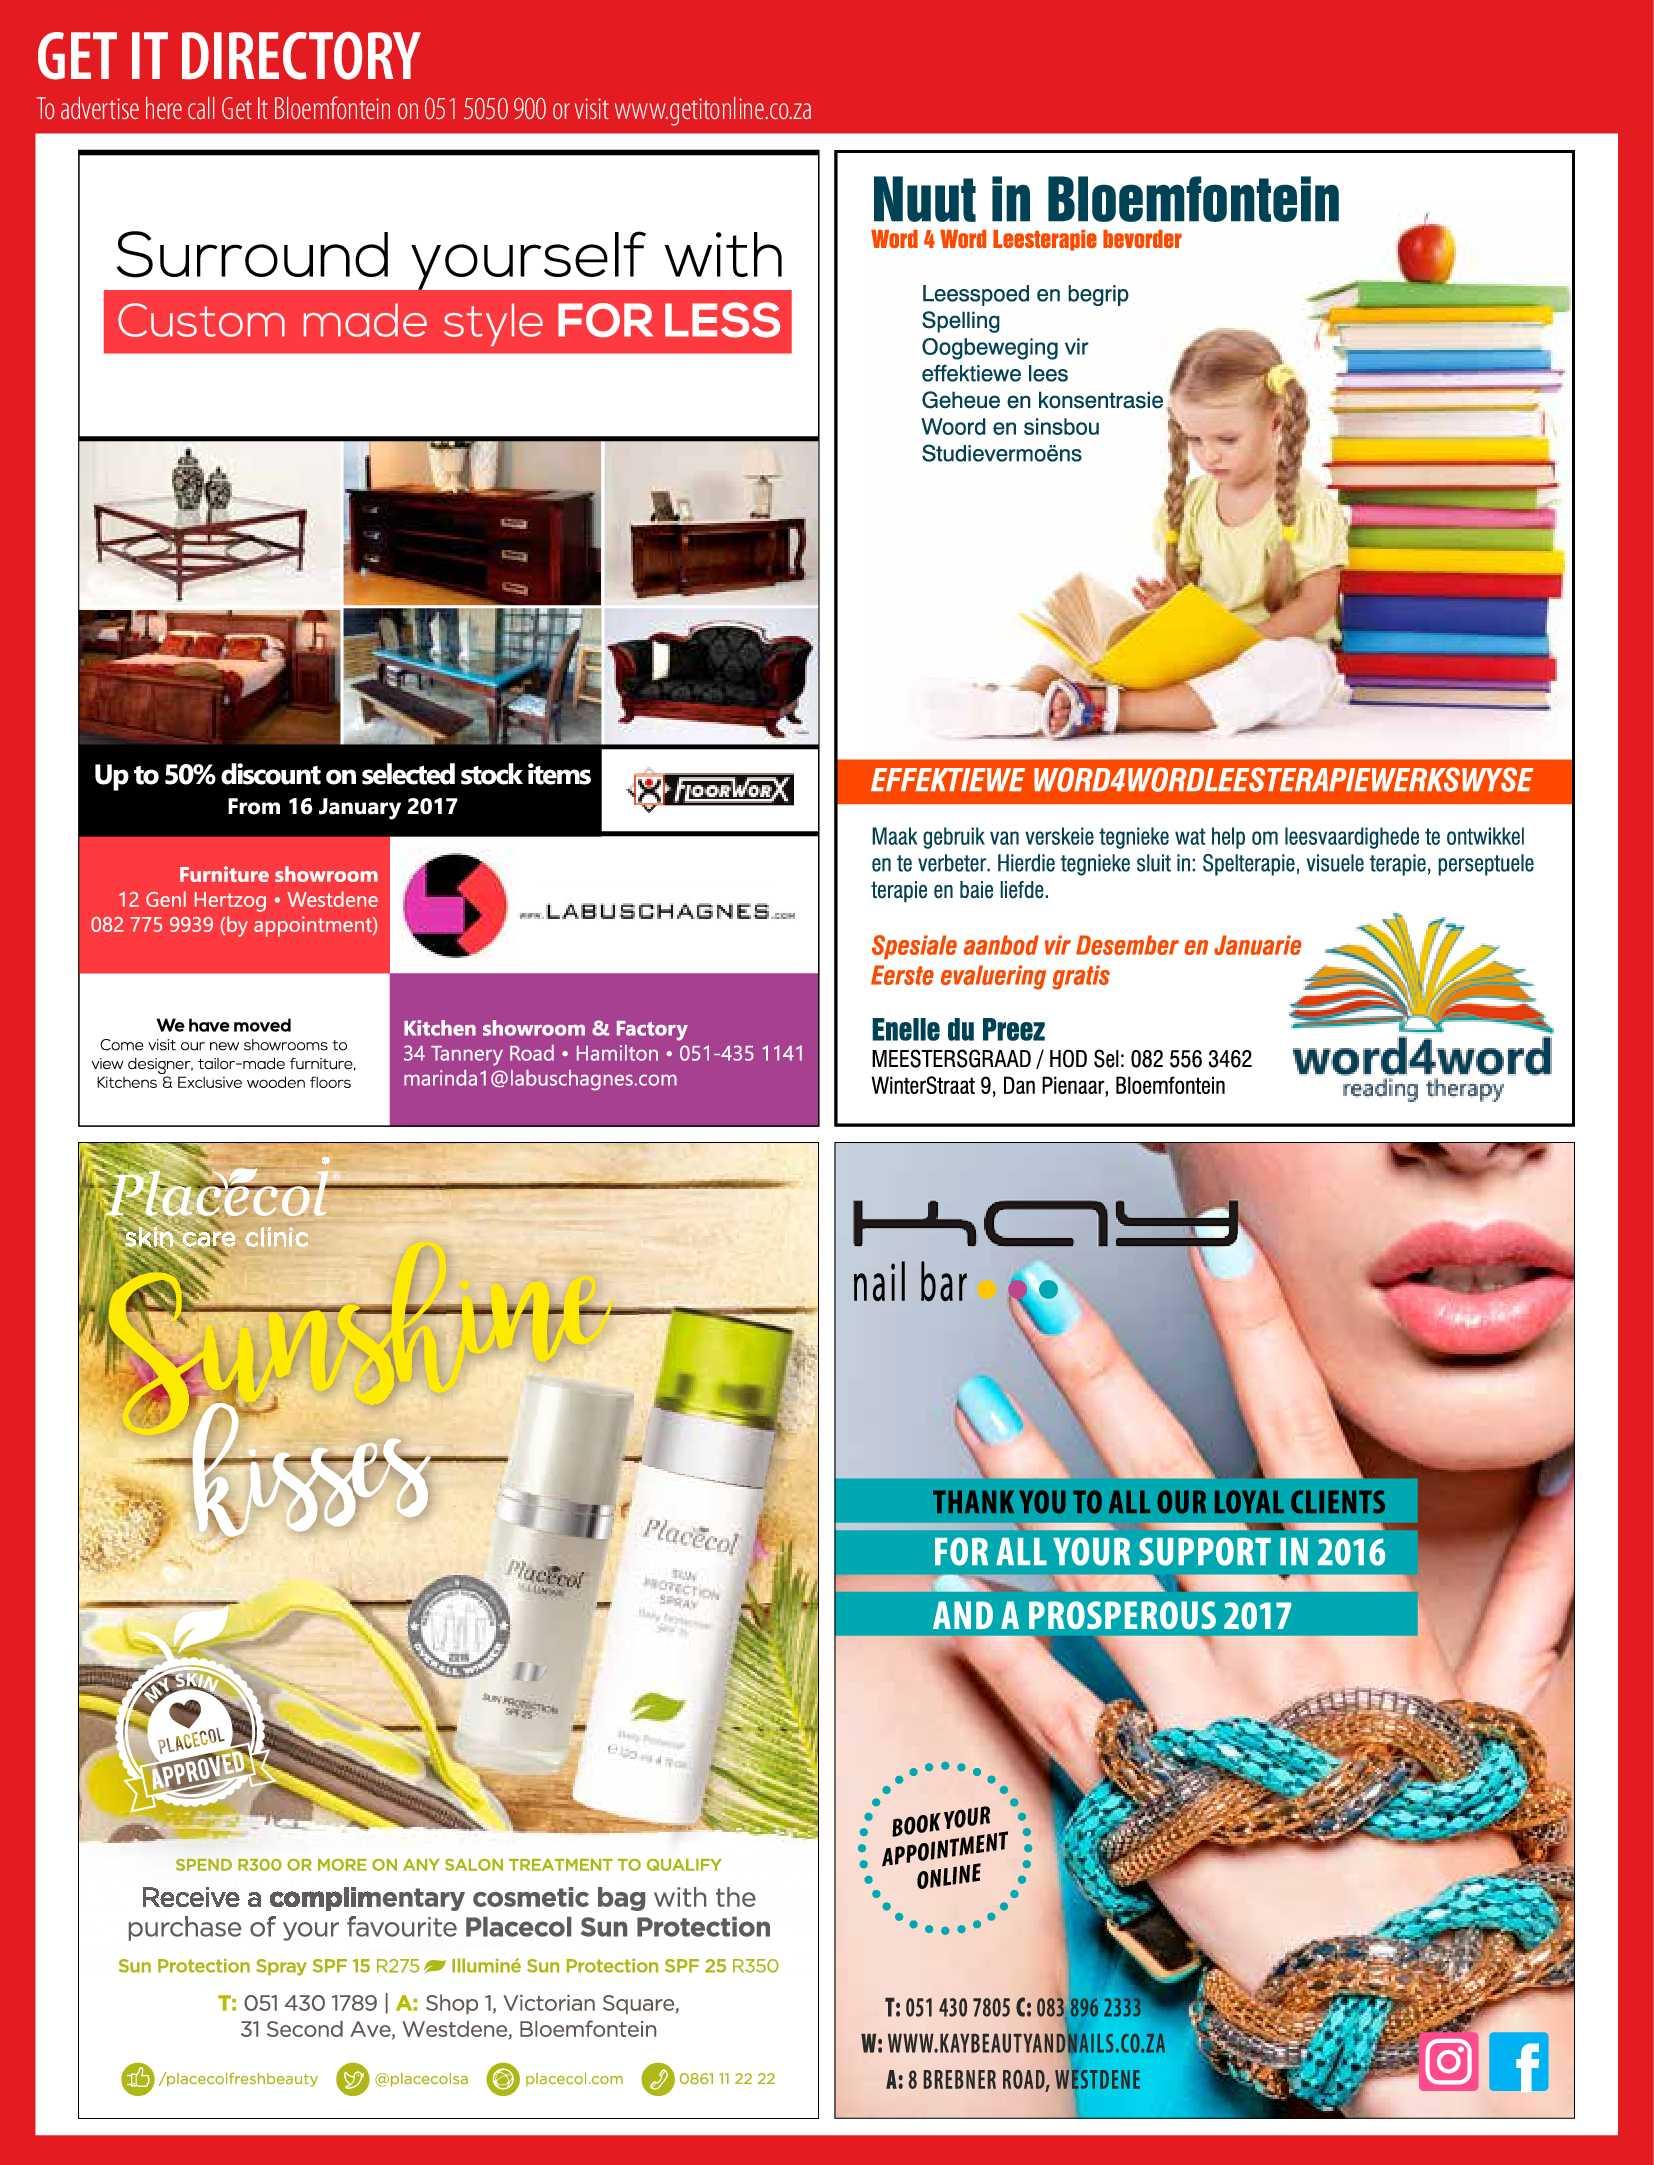 bloemfontein-getit-january-2017-epapers-page-24